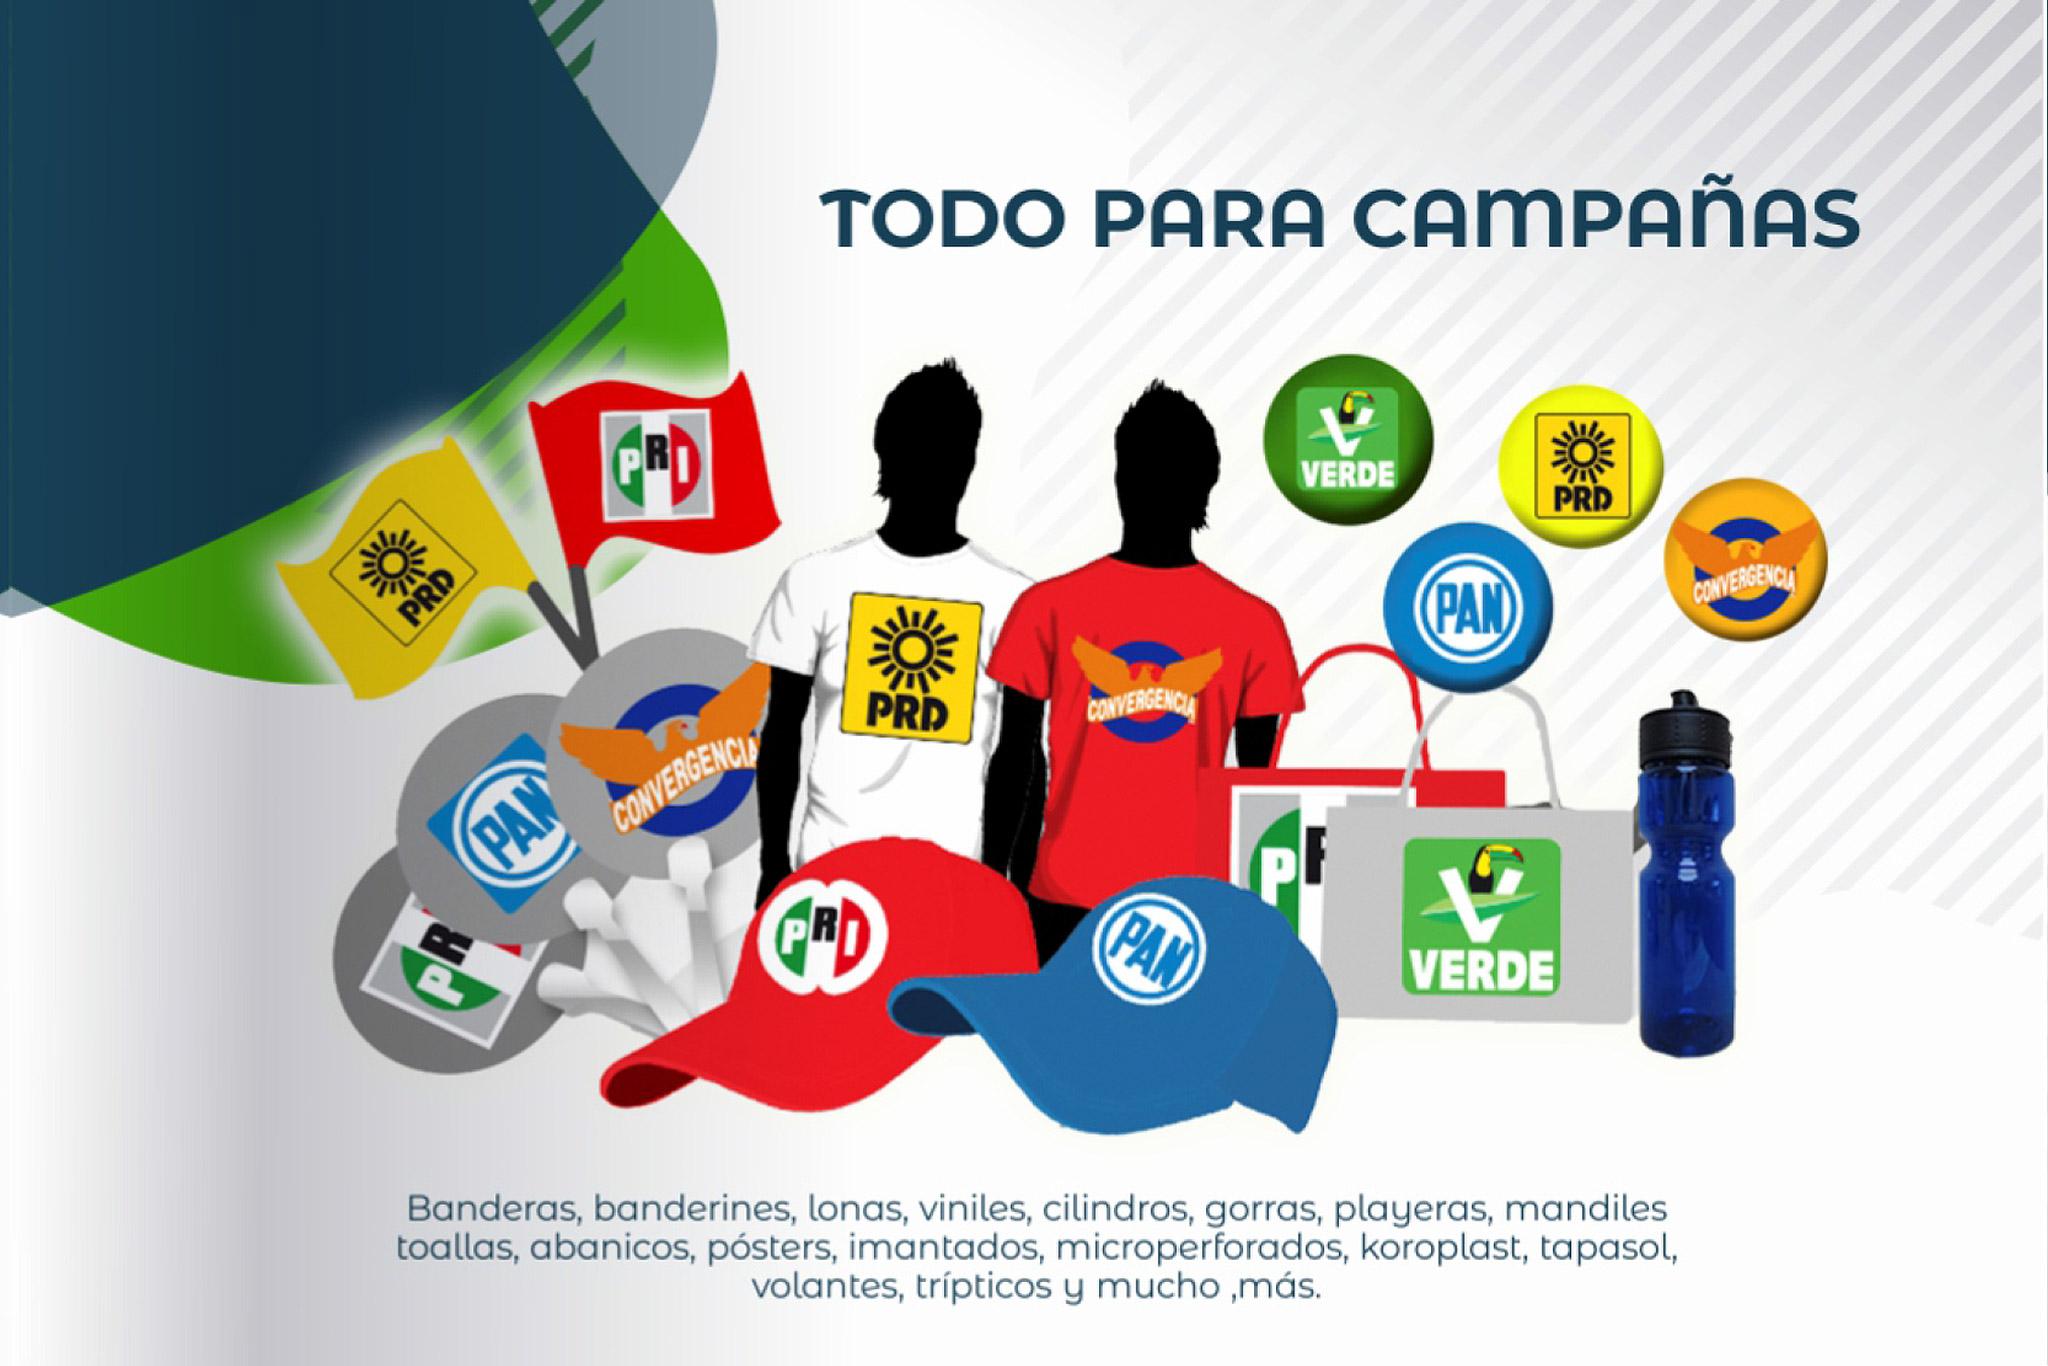 https://ardipu.com/wp-content/uploads/2019/07/campañas.jpg